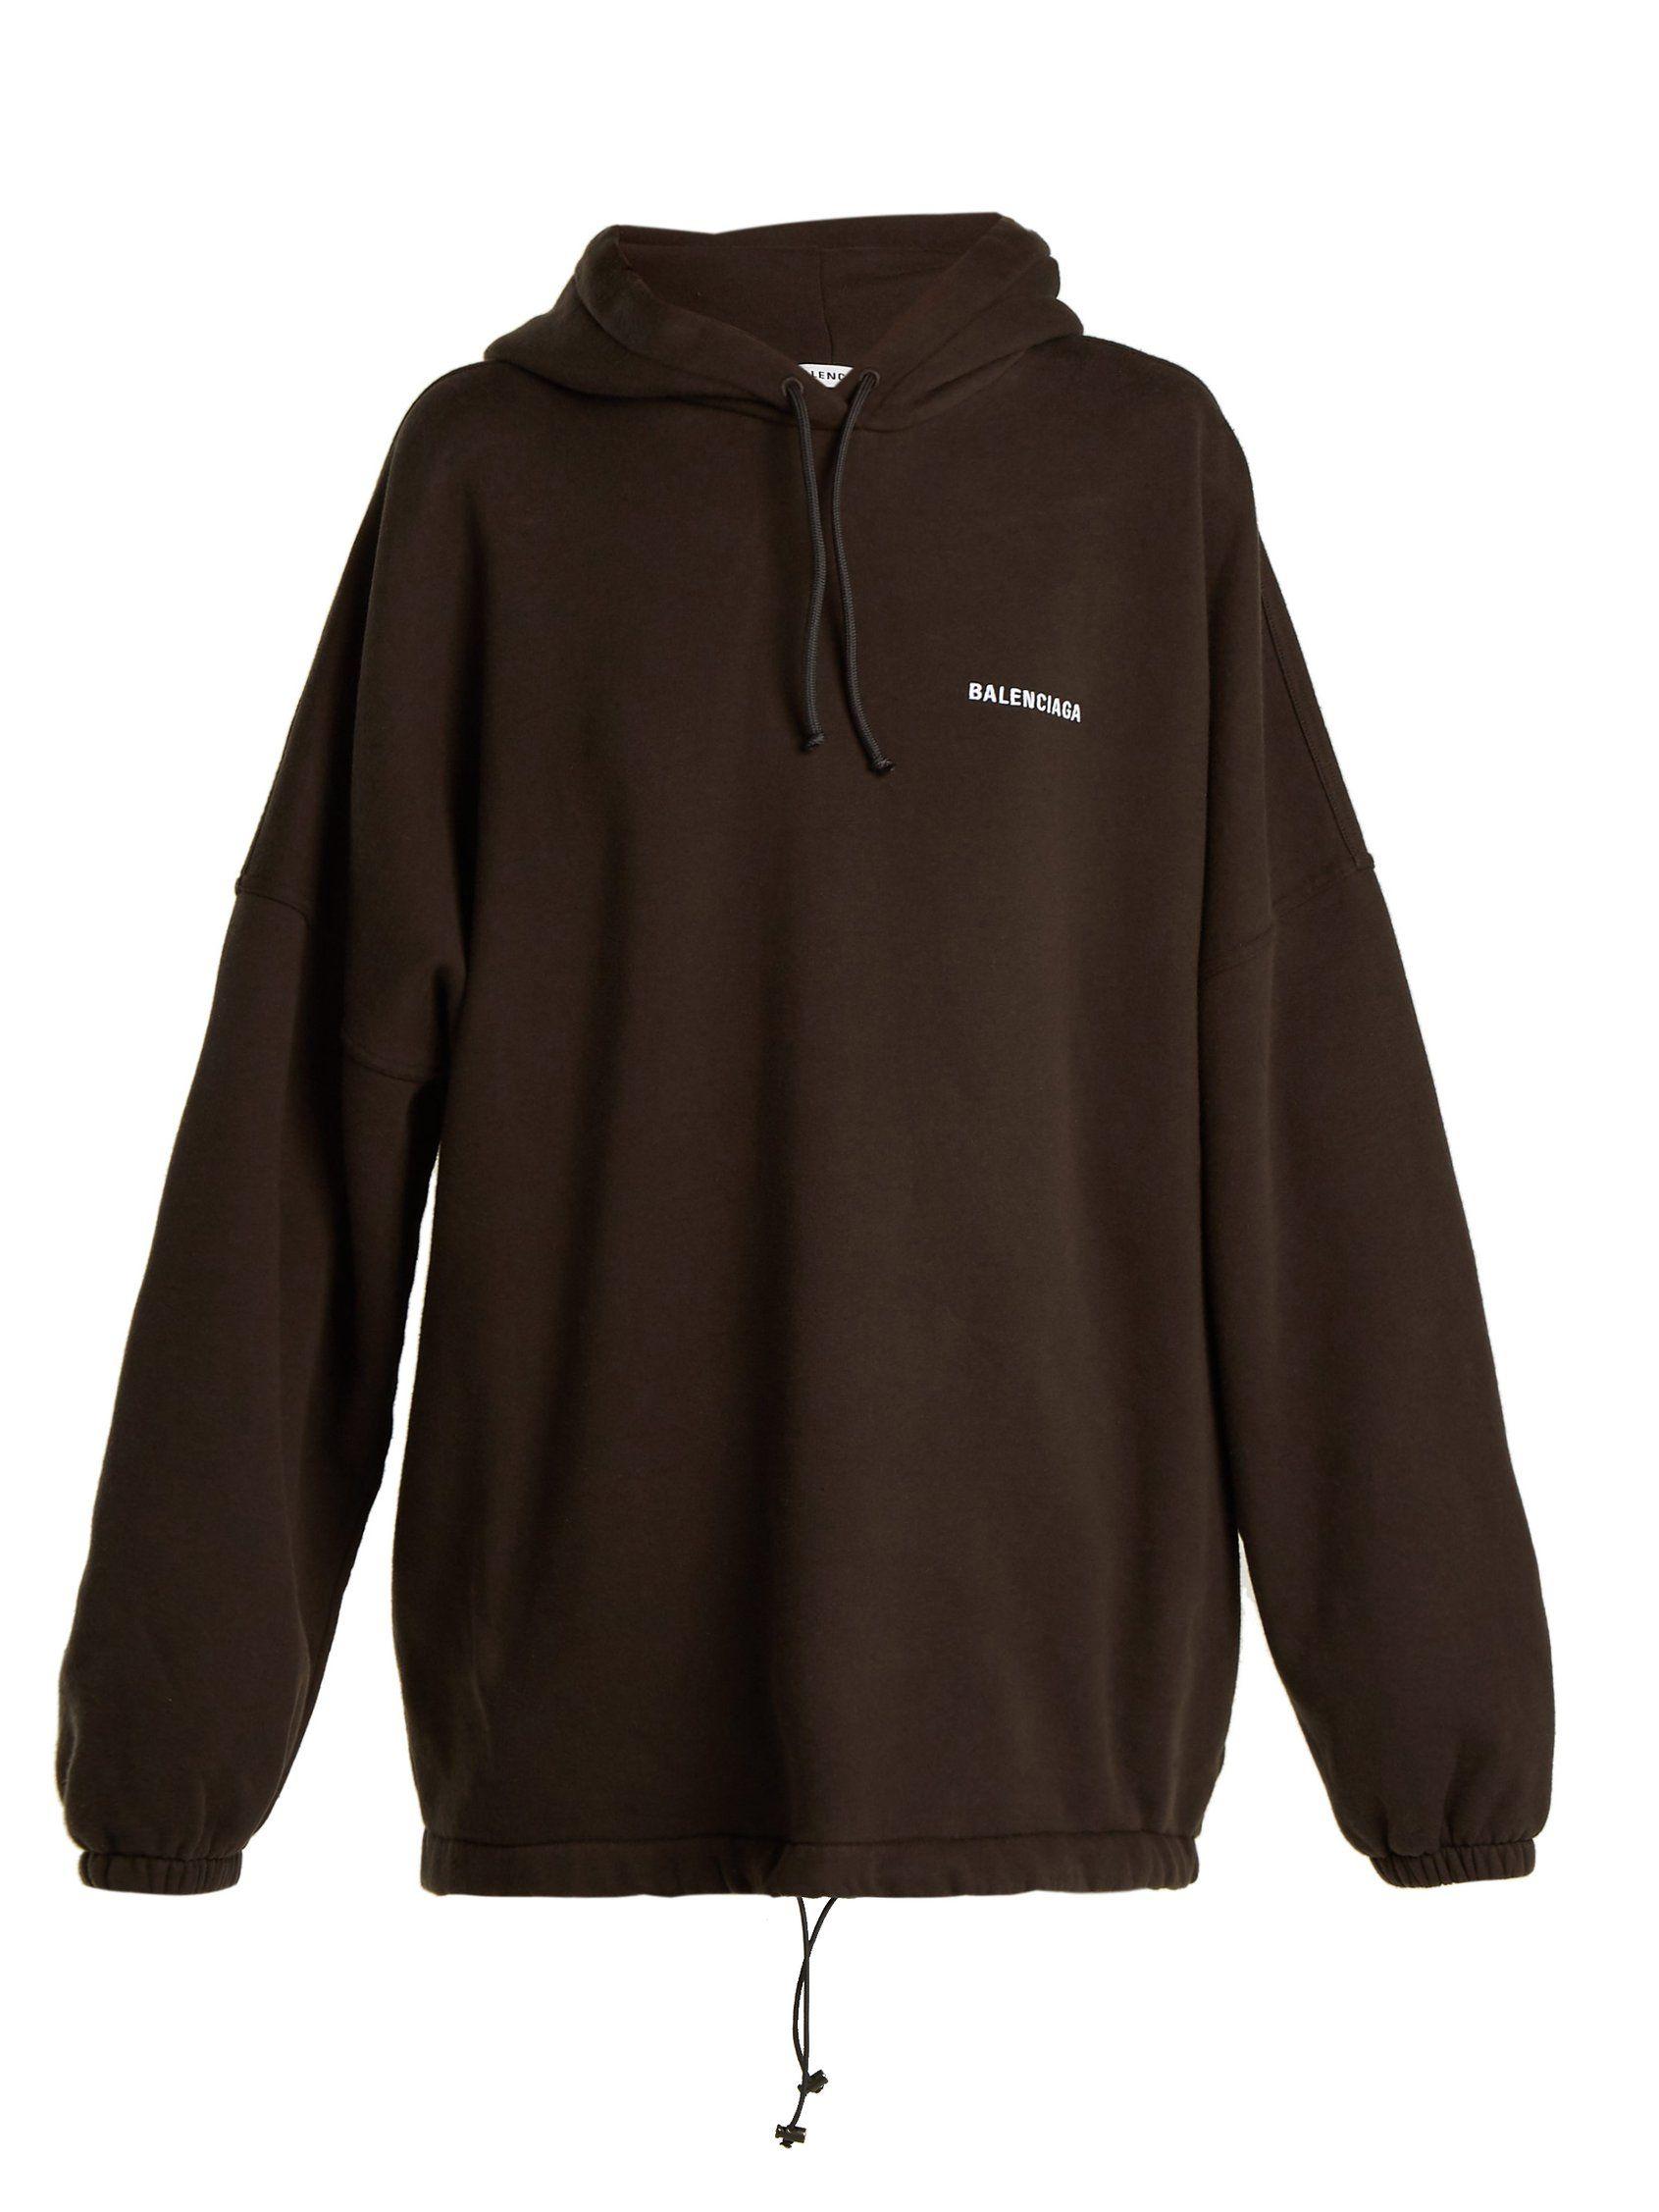 ShopBalenciaga logo hoodie with Express